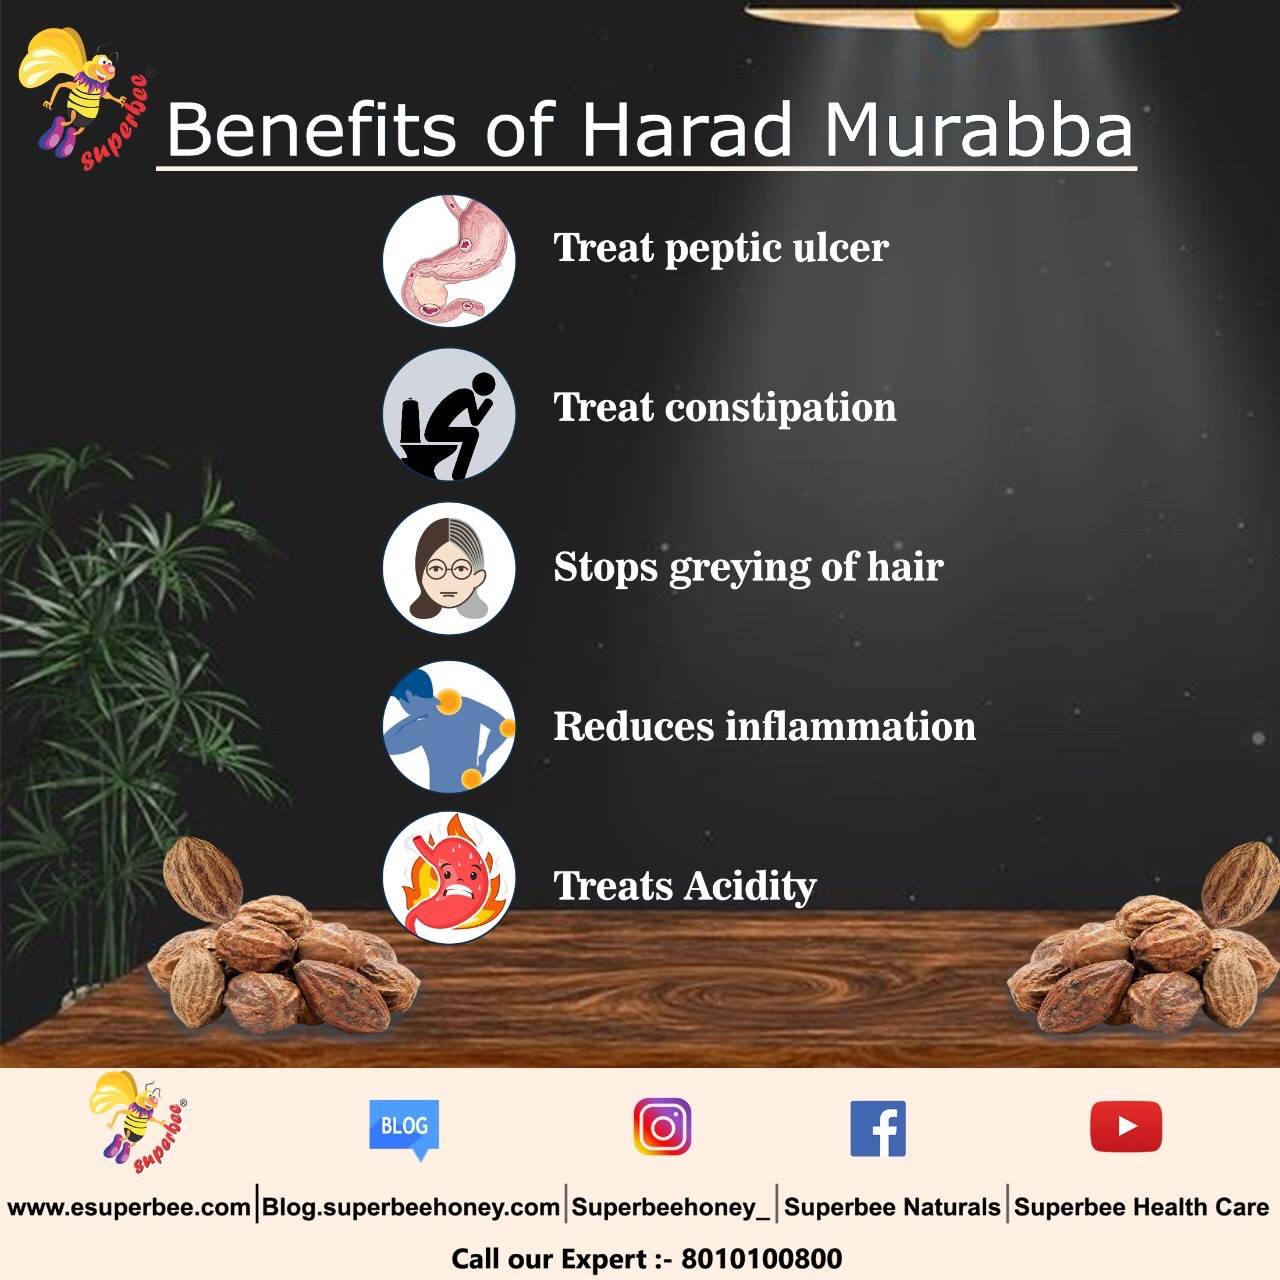 Benefits of Harad Murabba